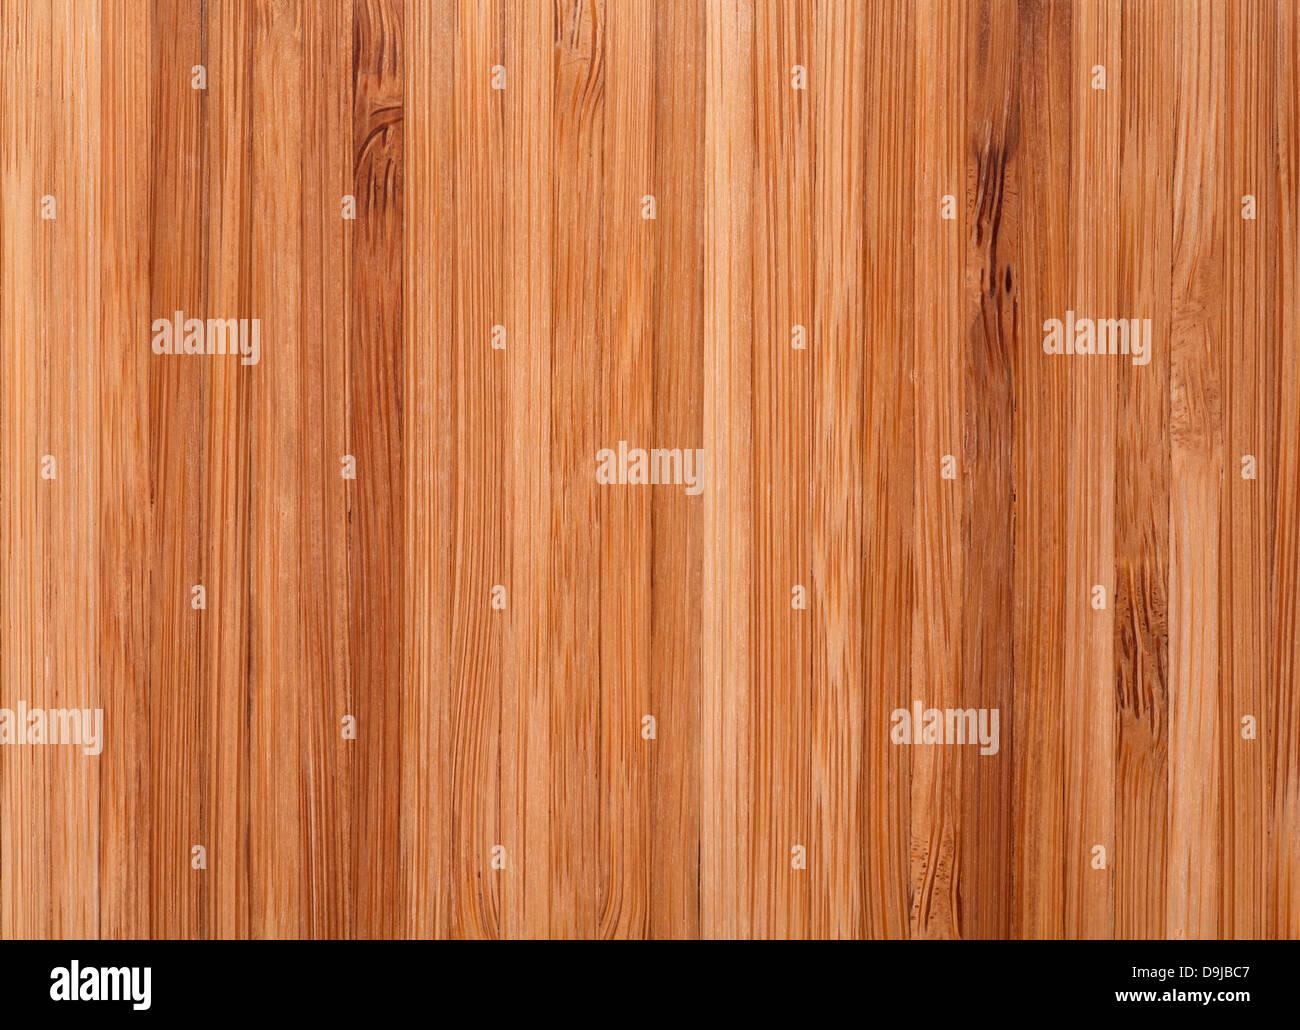 bambus holz hintergrundtextur stockfoto, bild: 57567111 - alamy